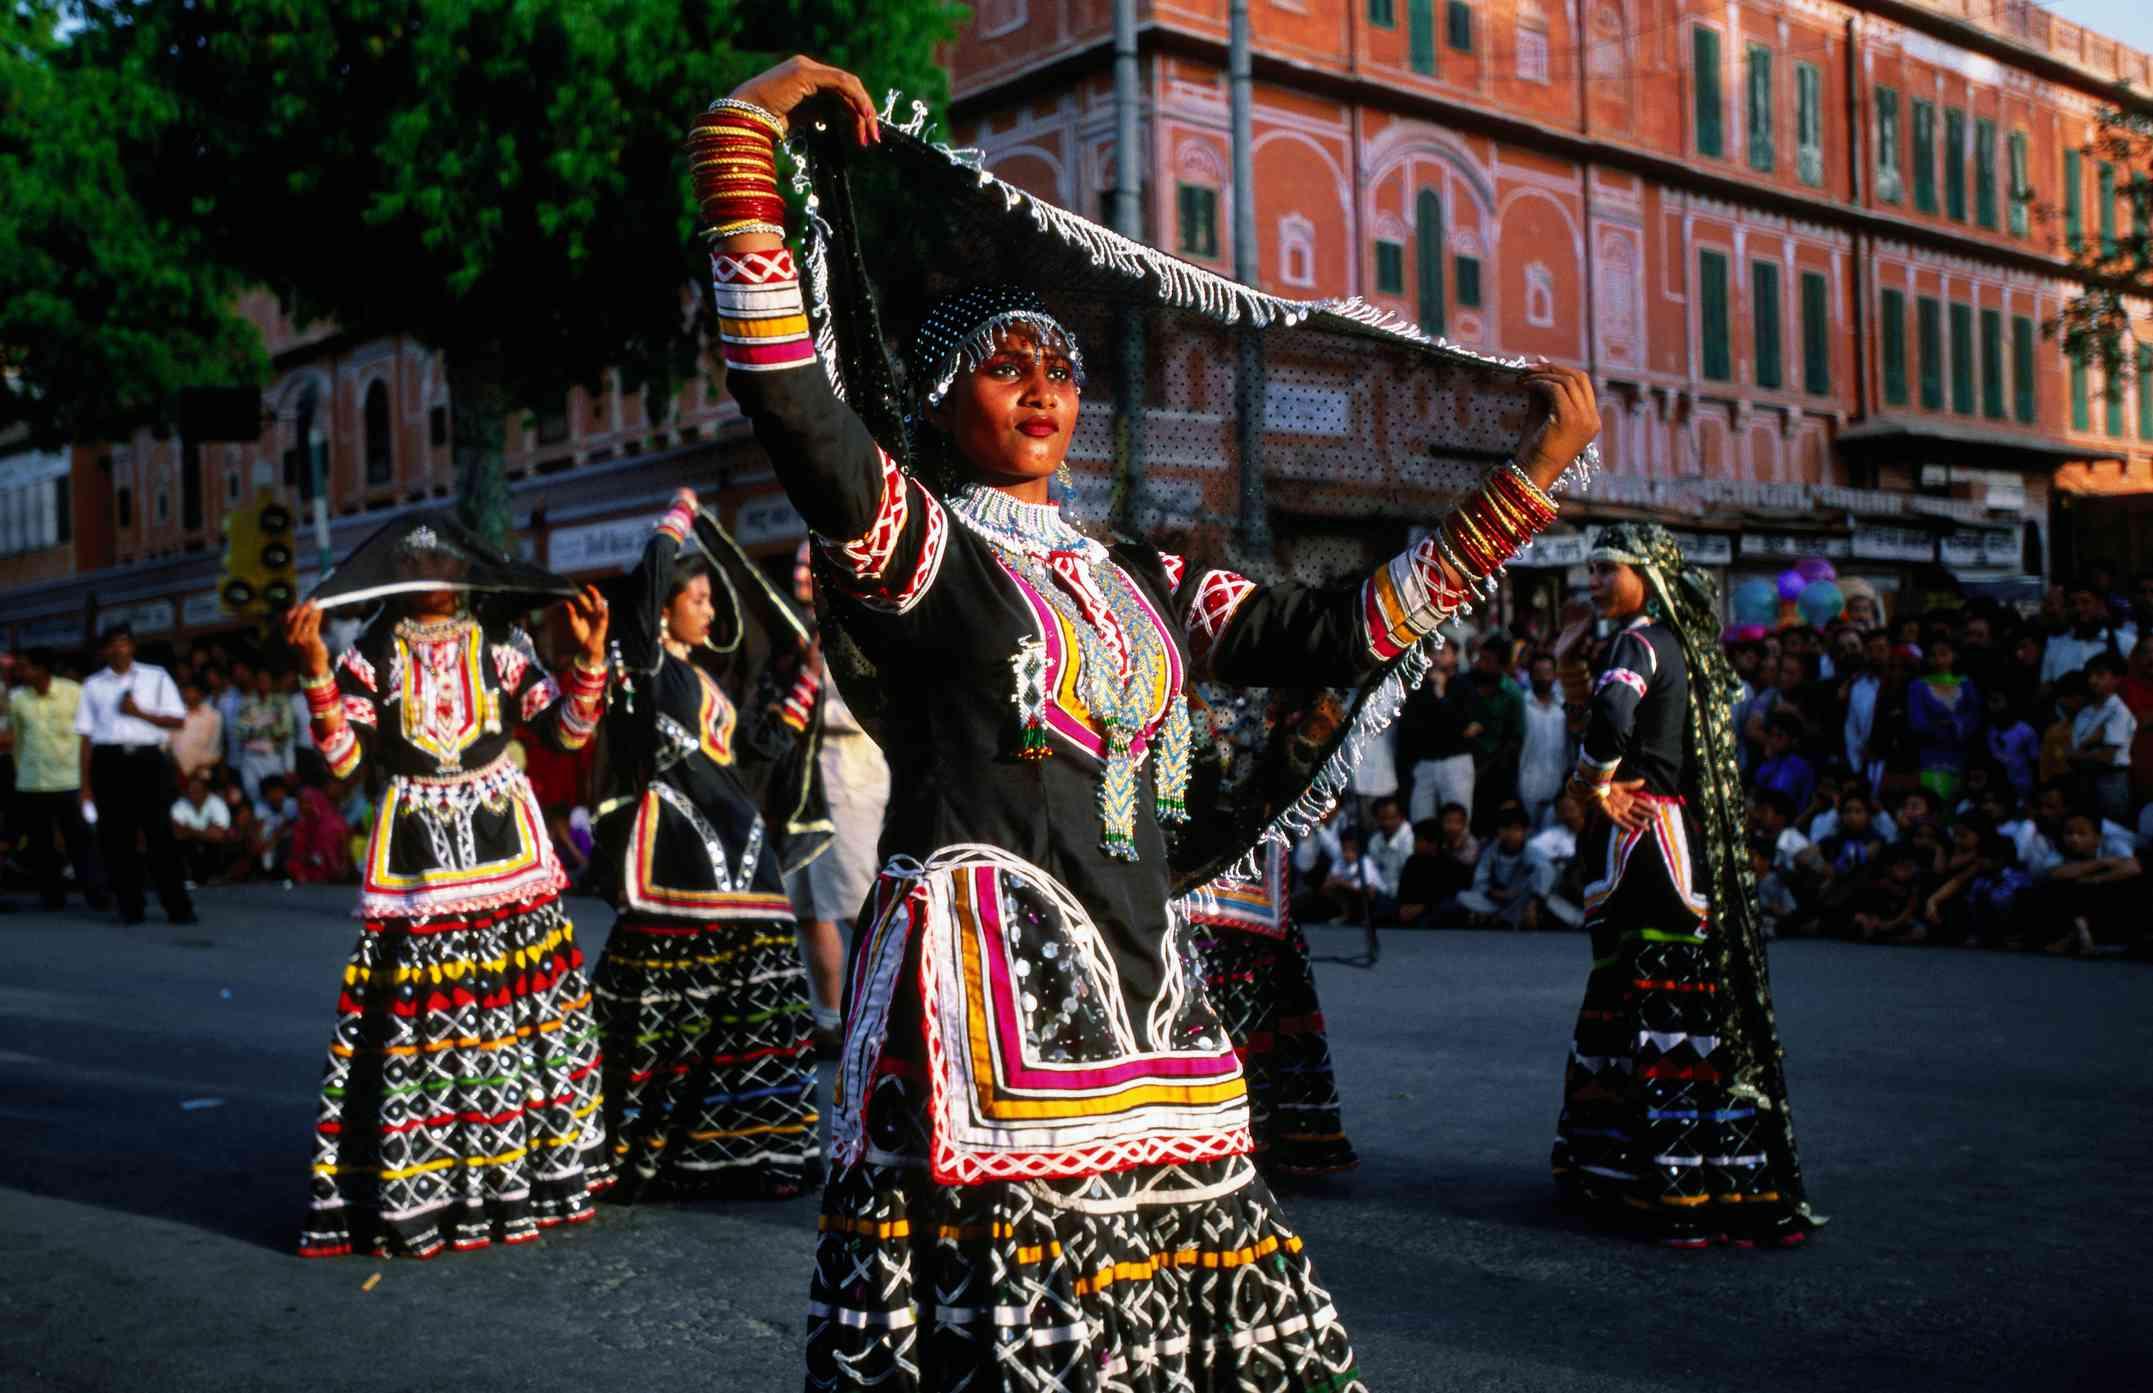 Female dancers from Bhil tribe at Gangaur Festival street parade.